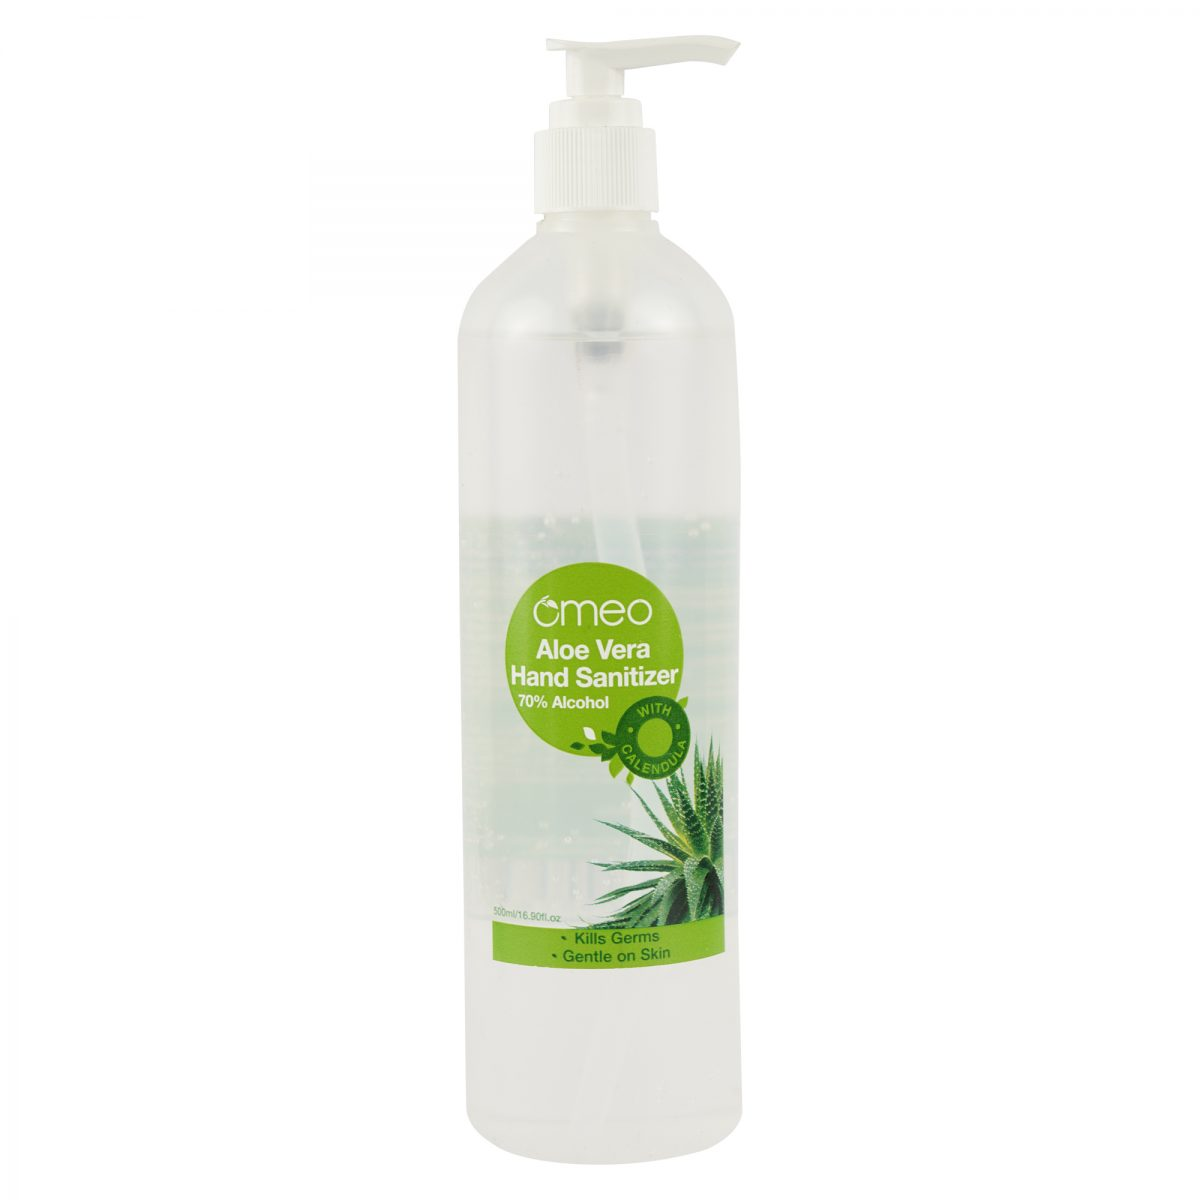 Omeo Aloe Vera Hand Sanitizer with Dispenser Online